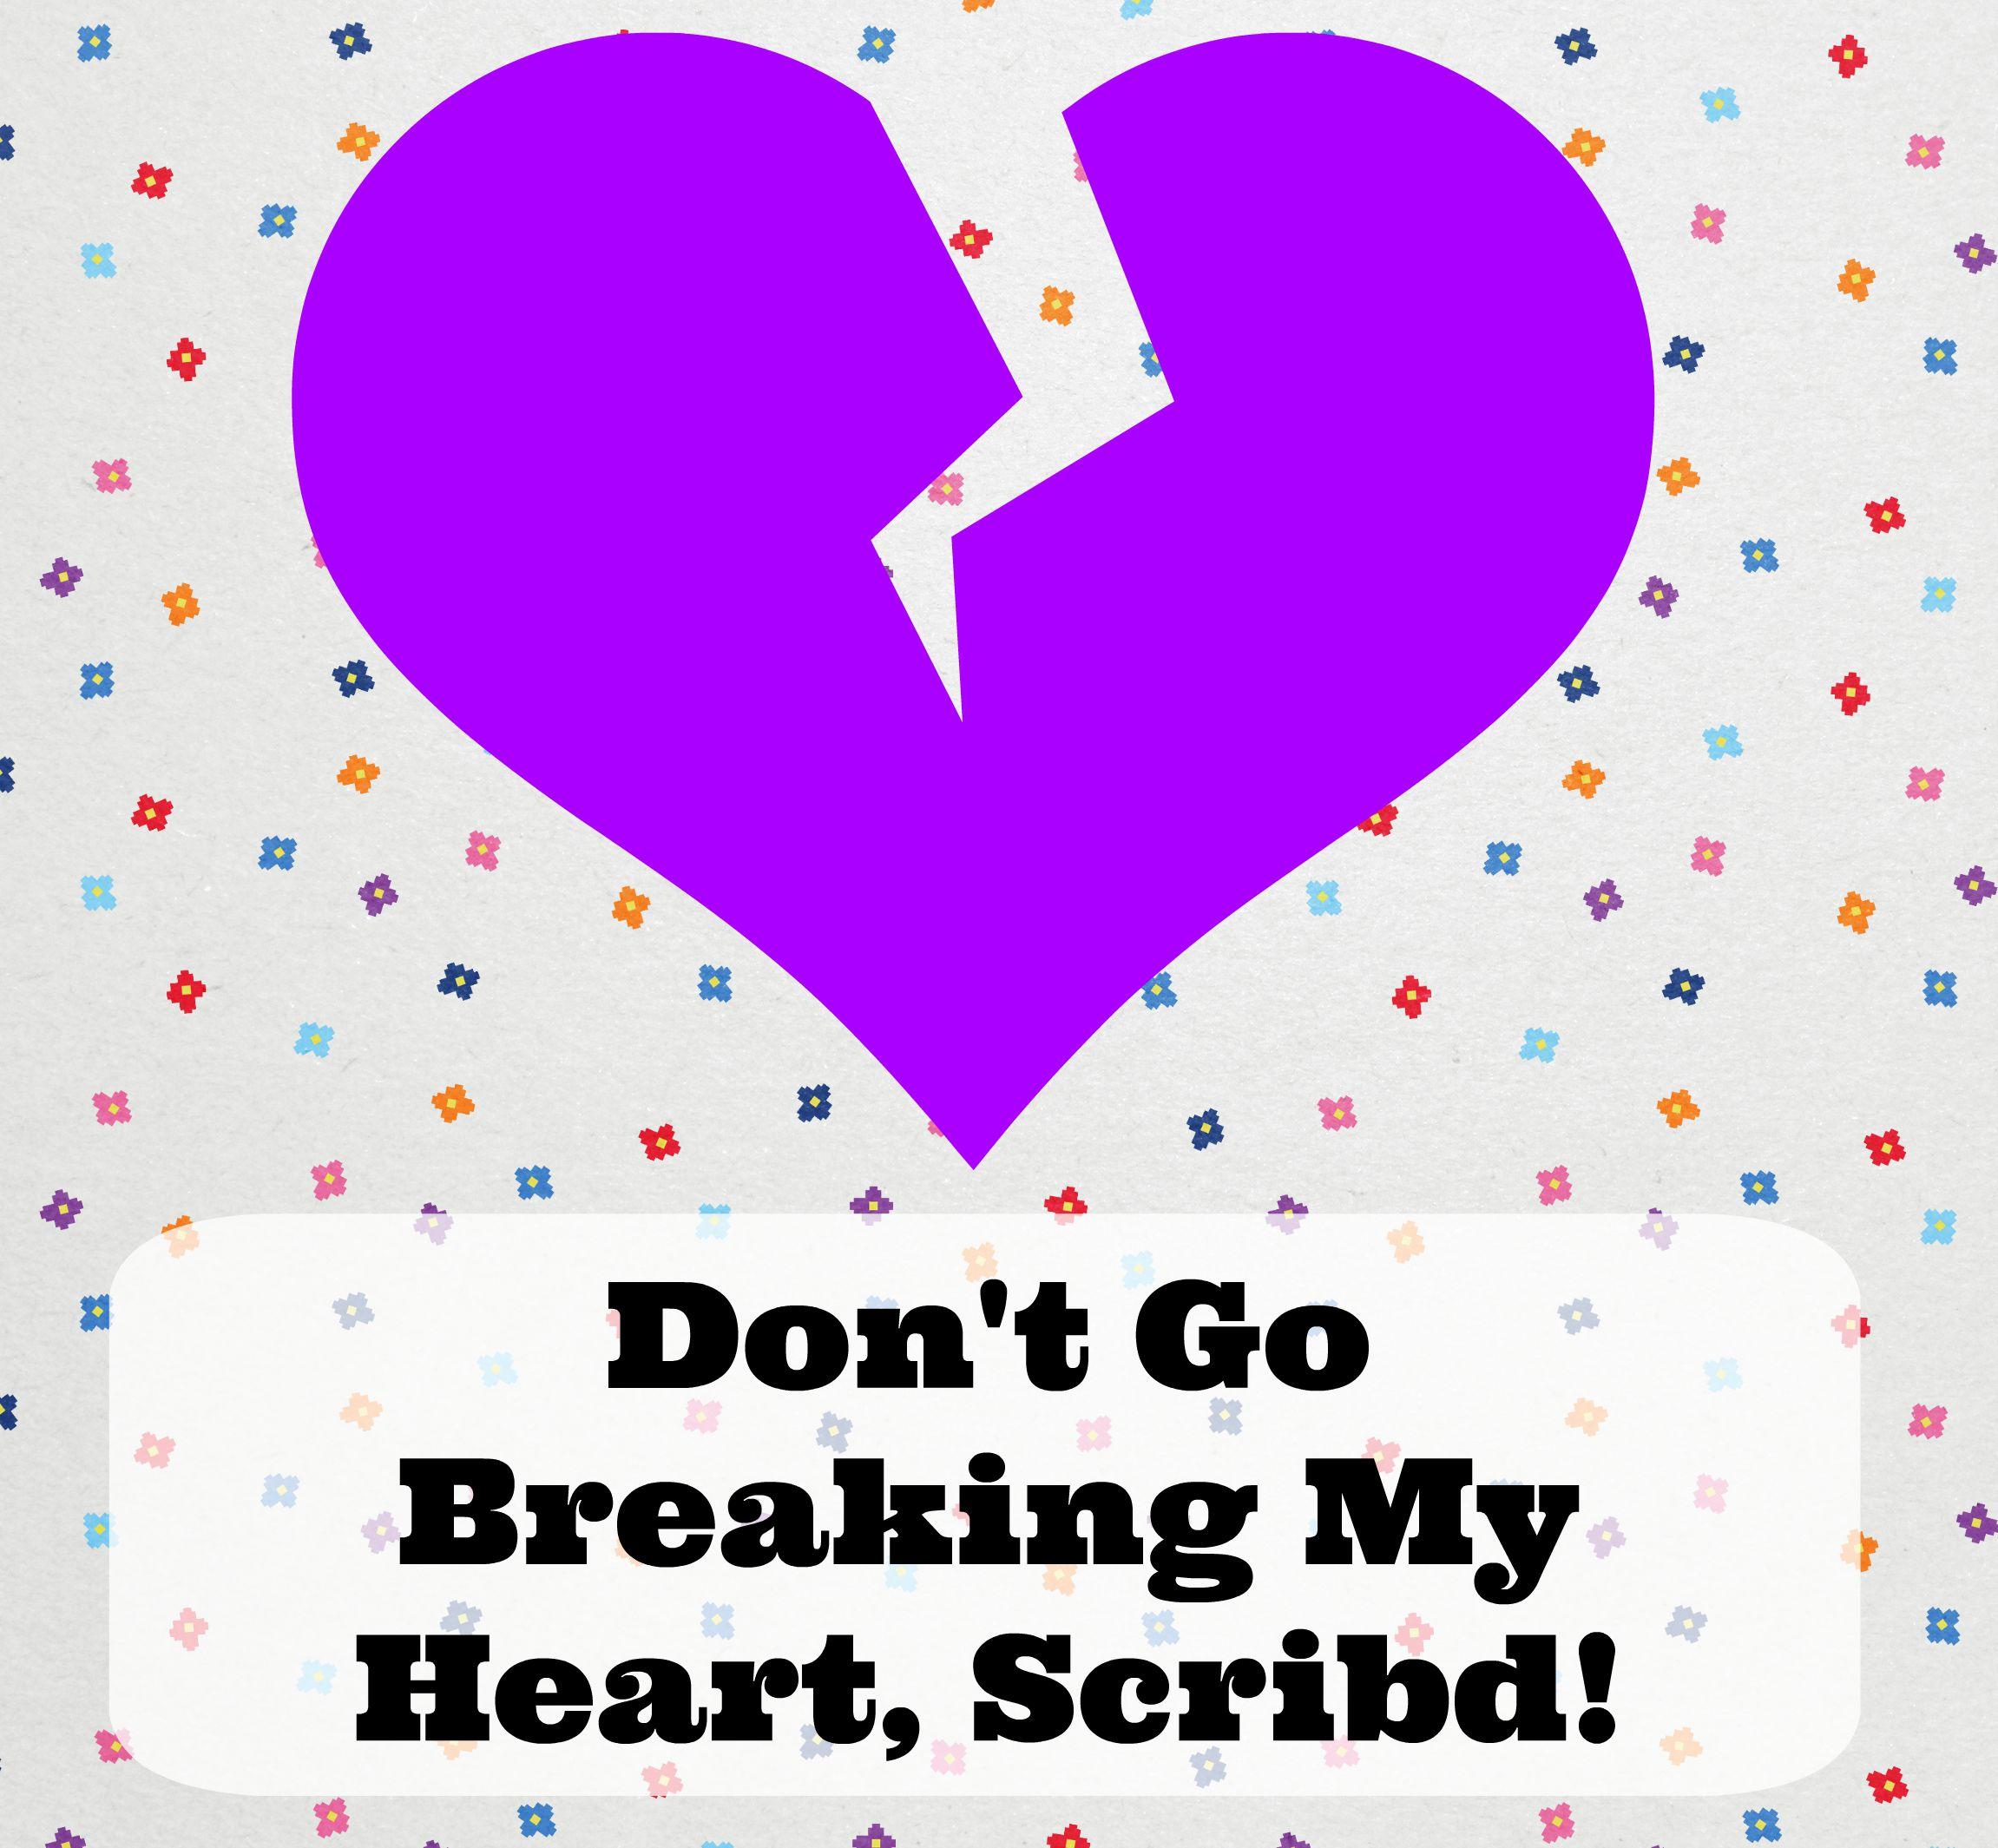 scribdheartbreak